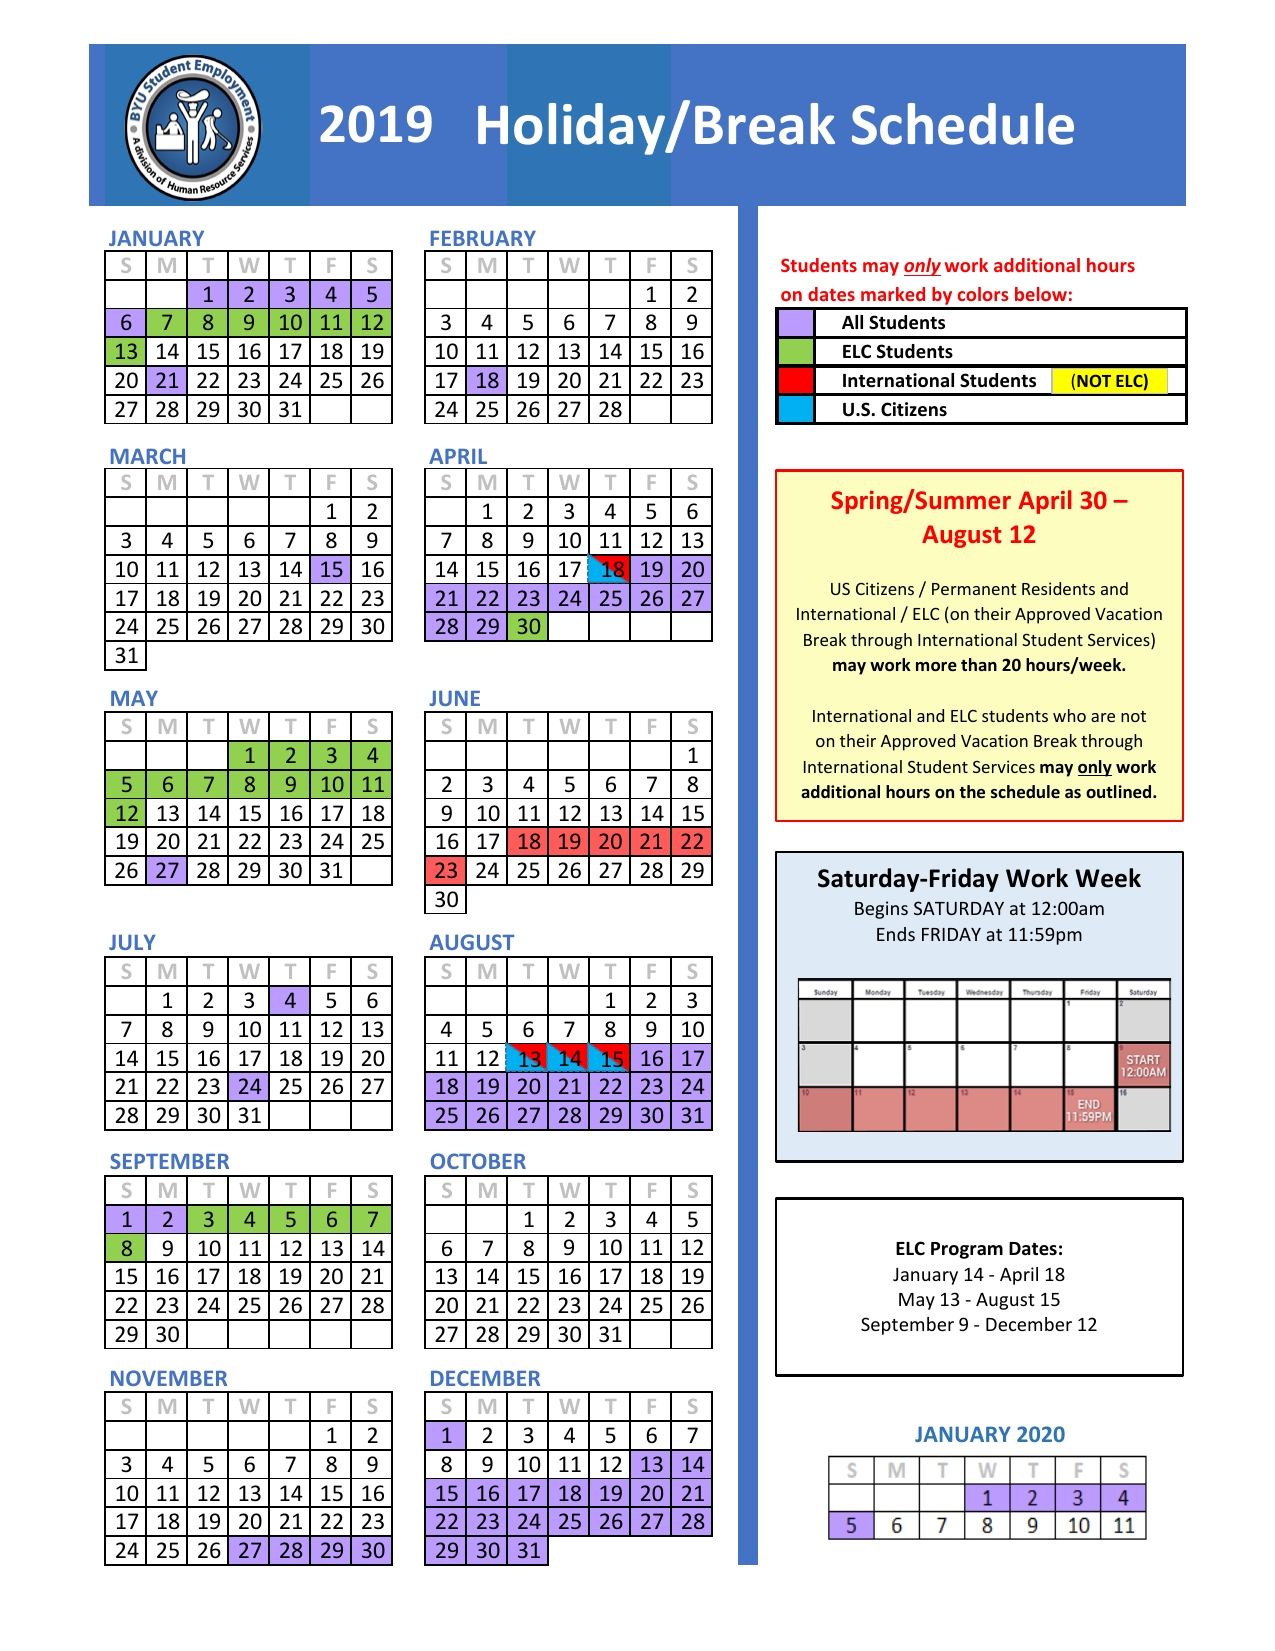 Holiday/break Schedule | Human Resource Services Calendar 2019 Summer